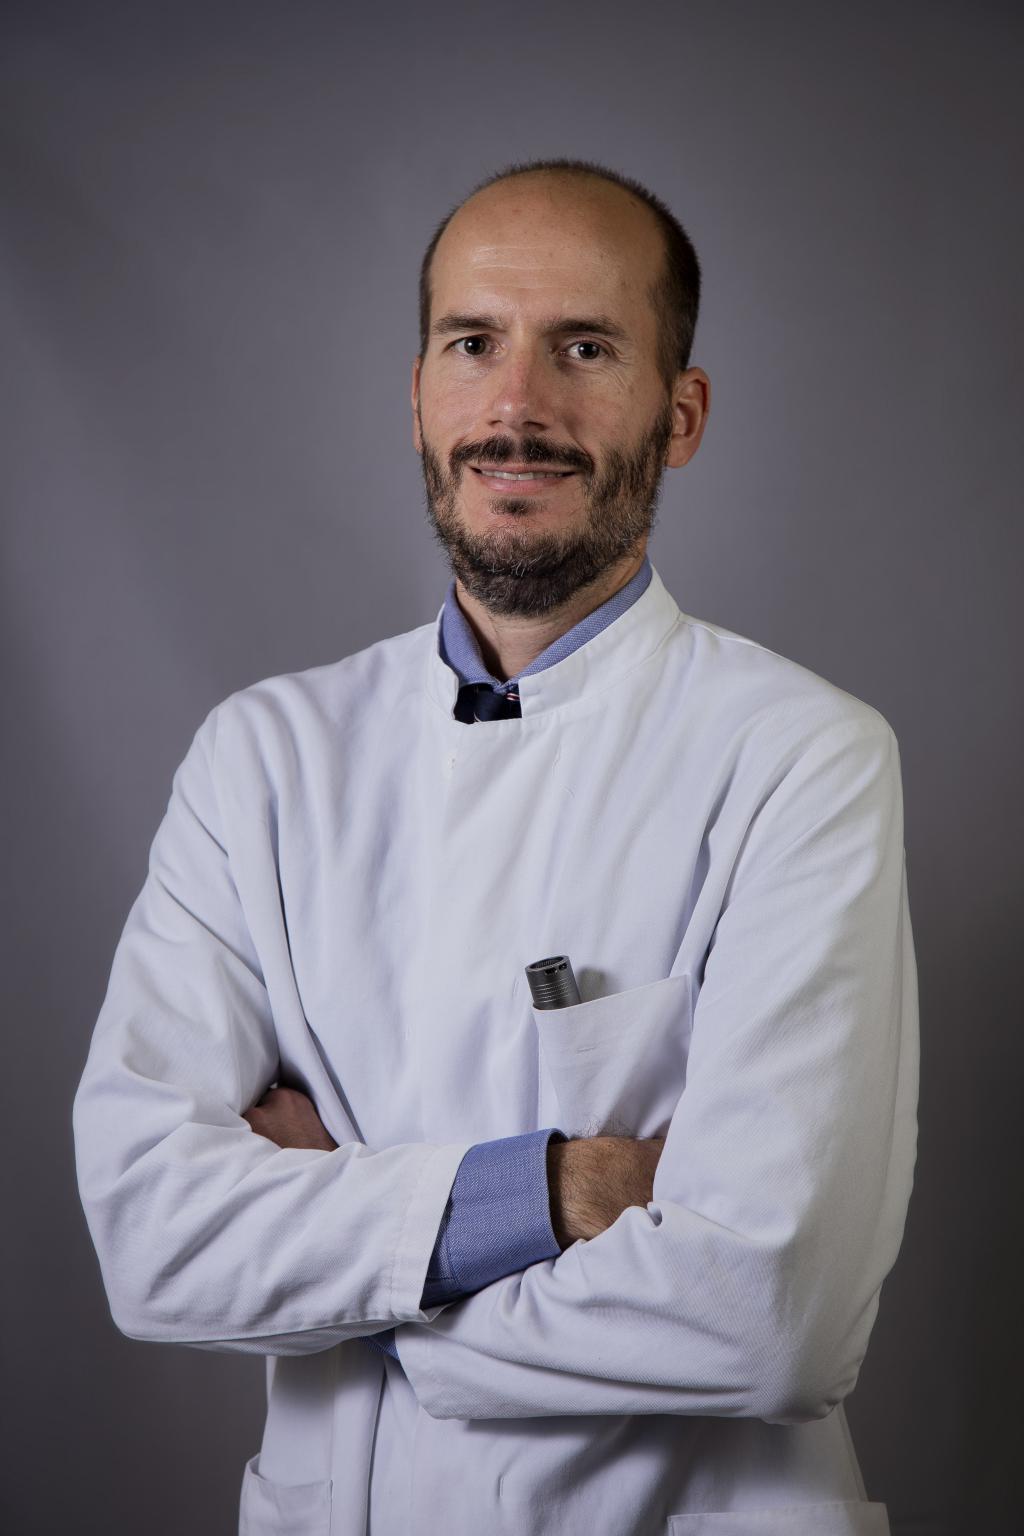 Alexander Manuel Bungue